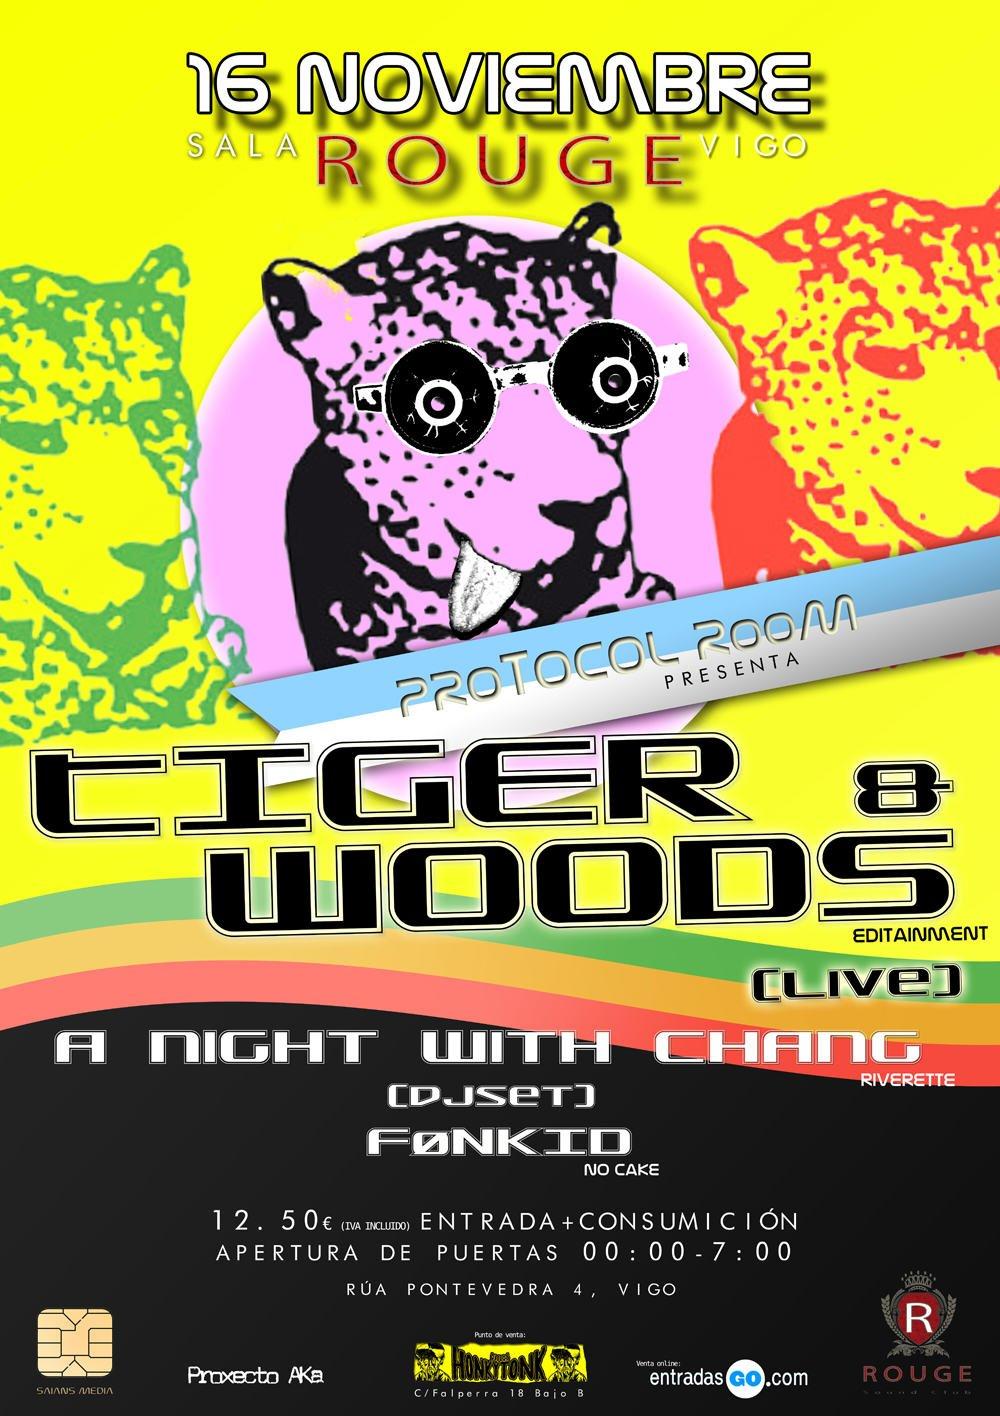 Primera visita de TIGER[and]WOODS a Vigo